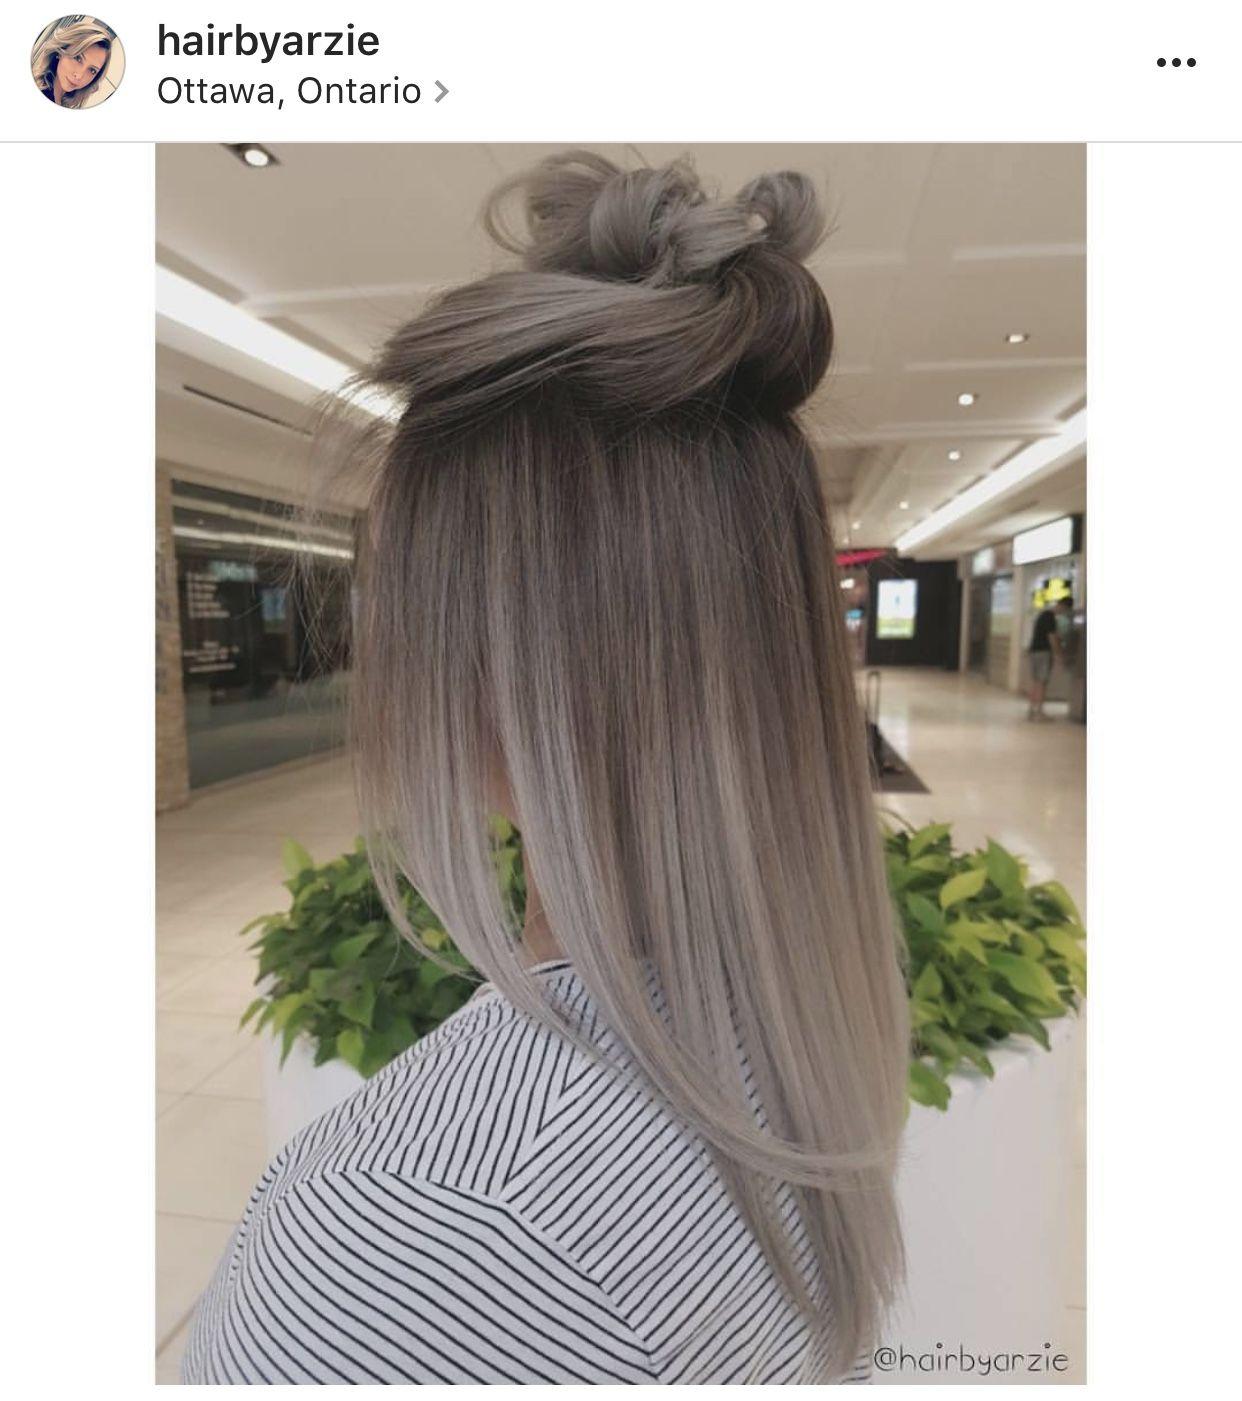 Cabello  Peinados en 2019  Cabello Color gris cabello y